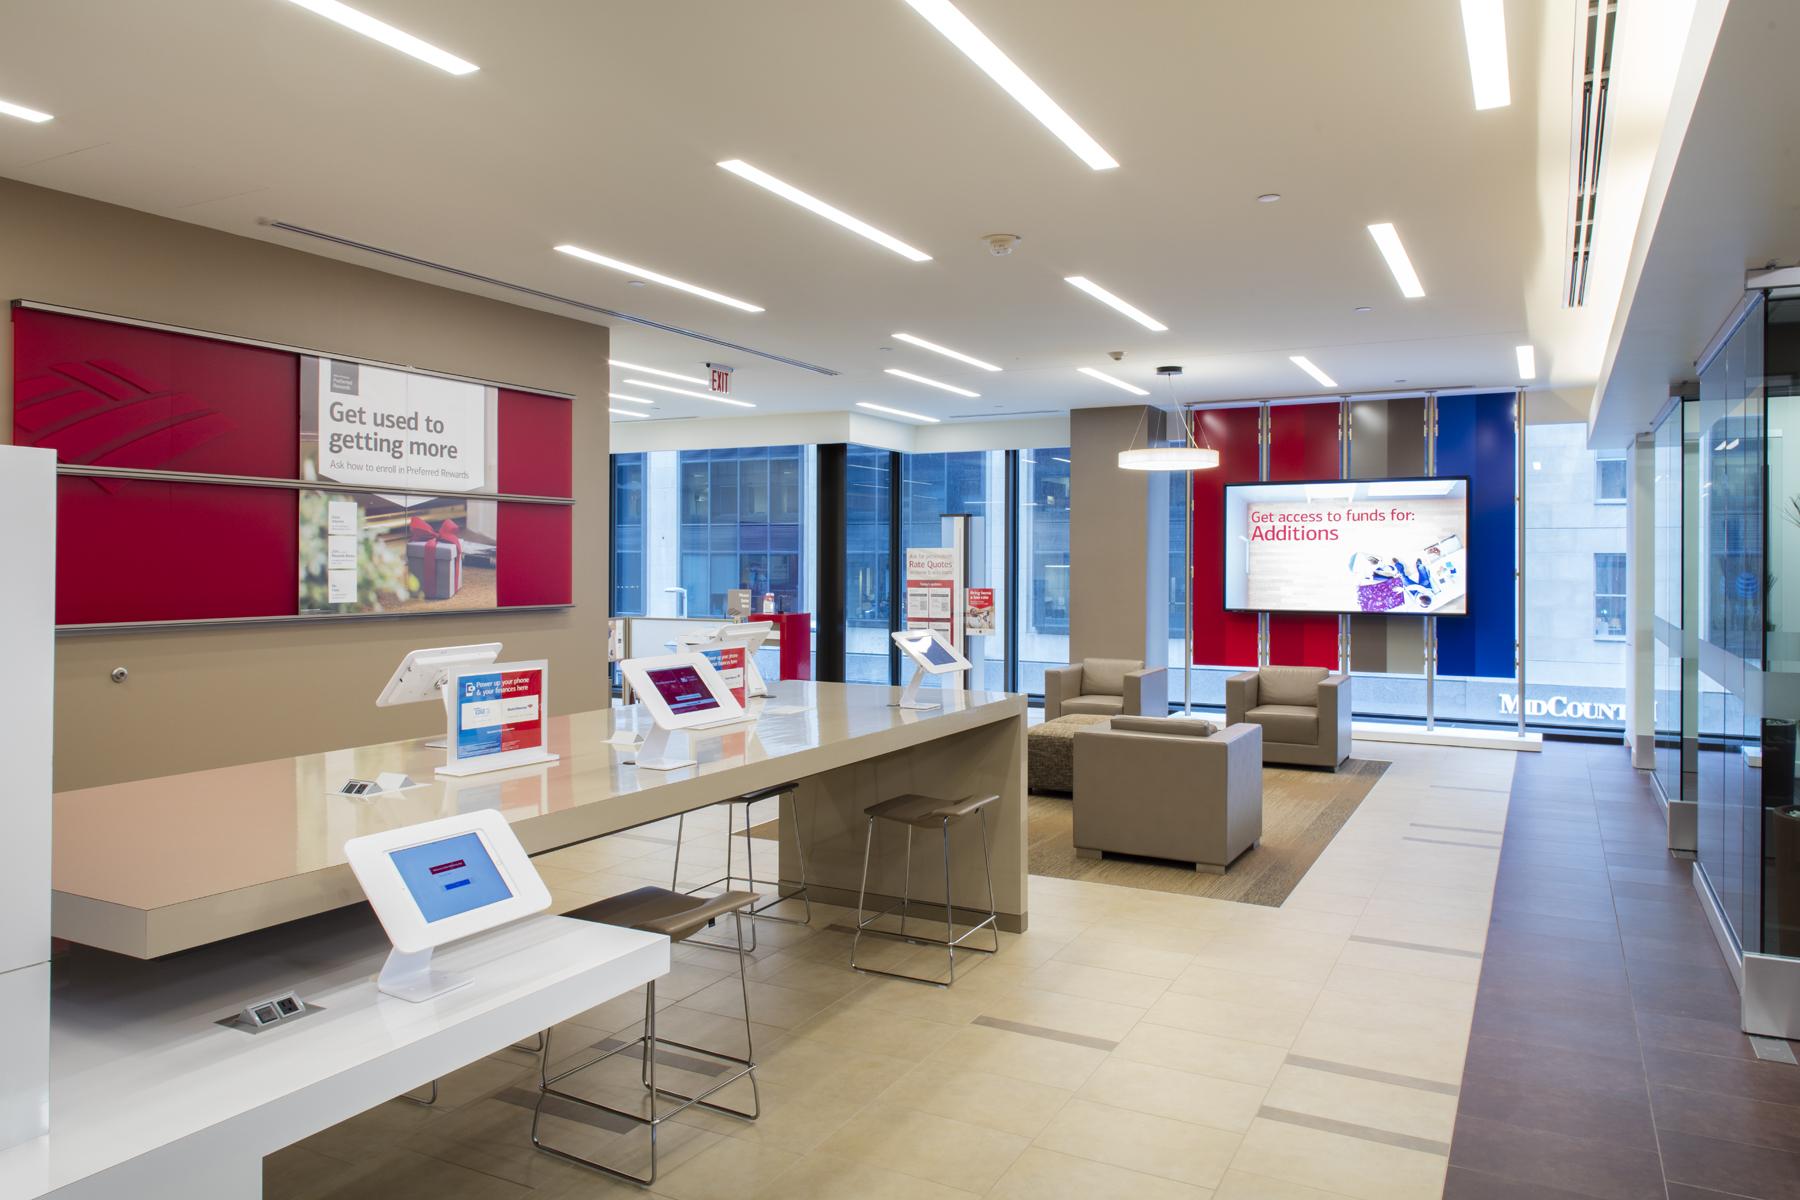 Lobby of a modern Bank of America branch